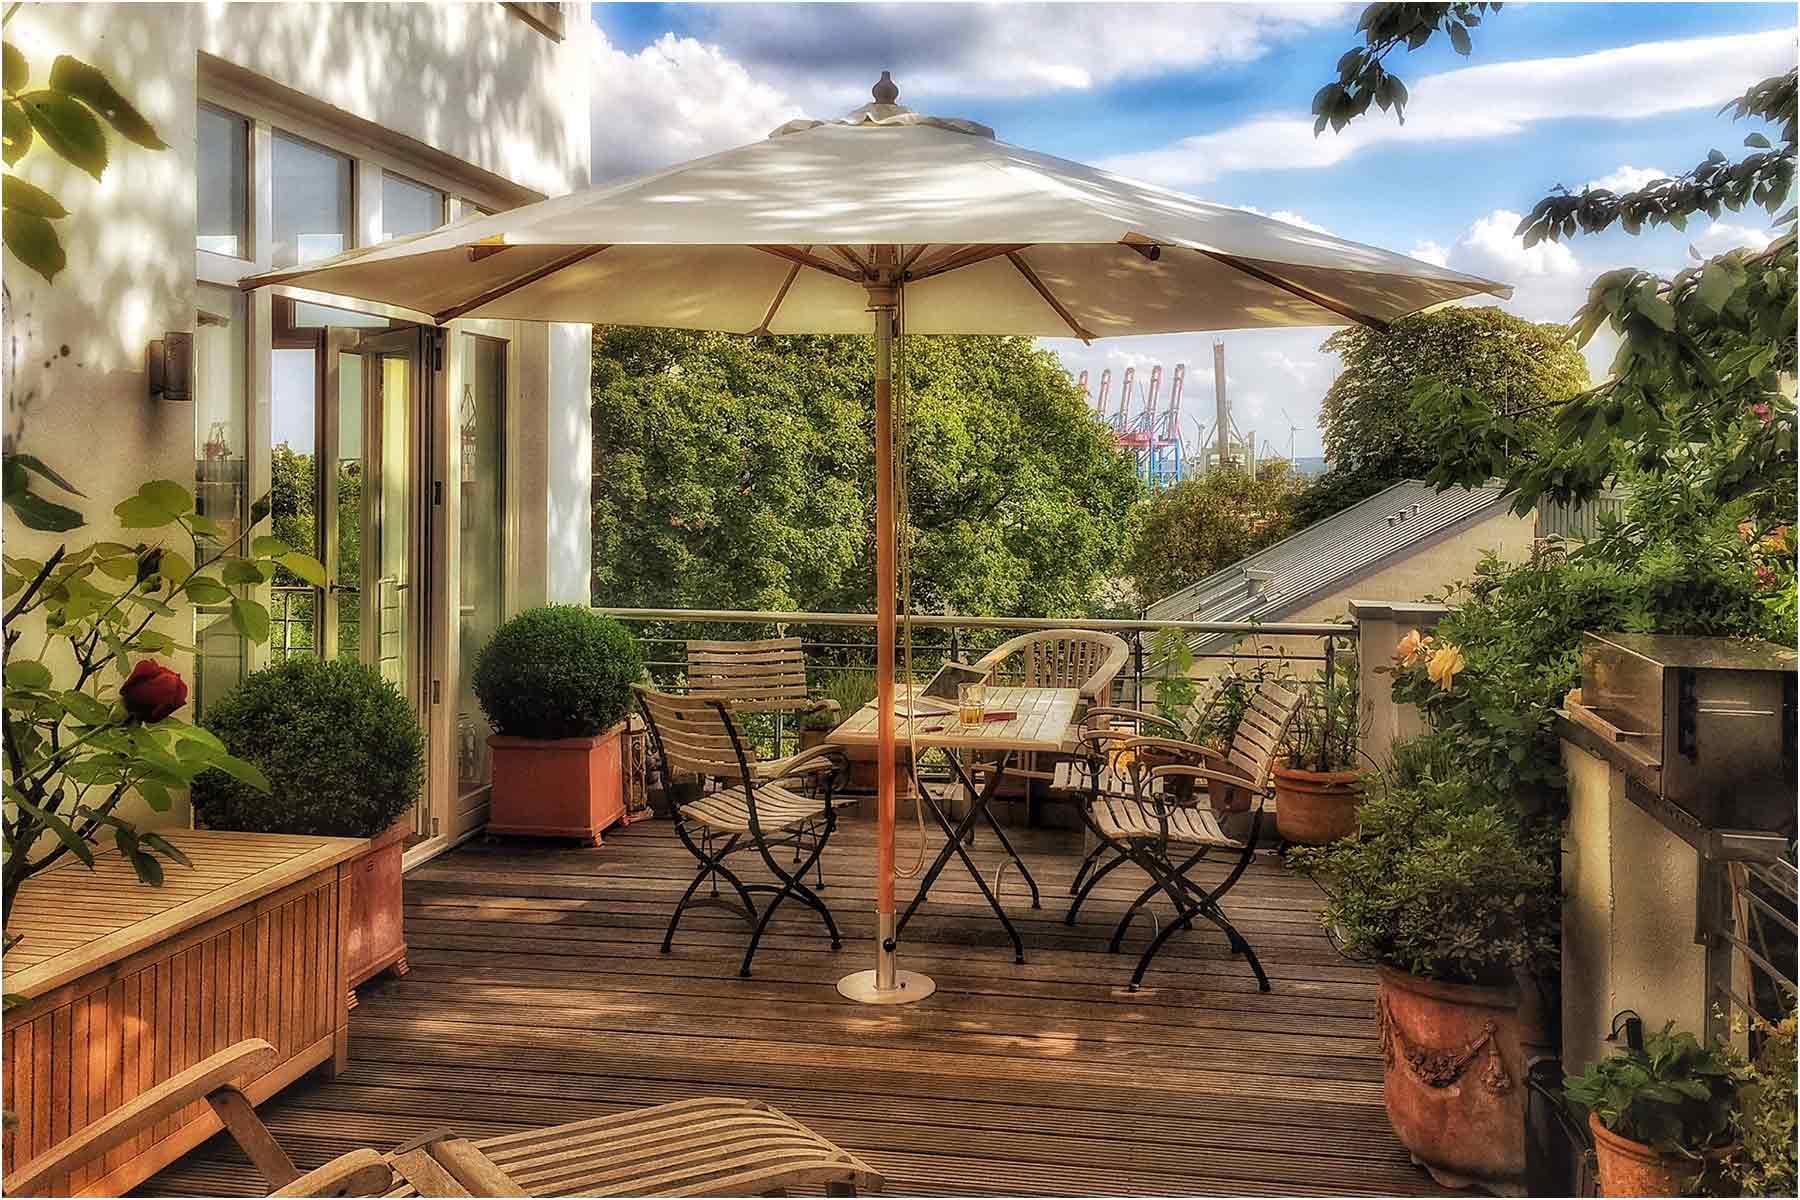 Stunning terrazza o terrazzo ideas idee arredamento casa - Terrazzo o terrazza ...